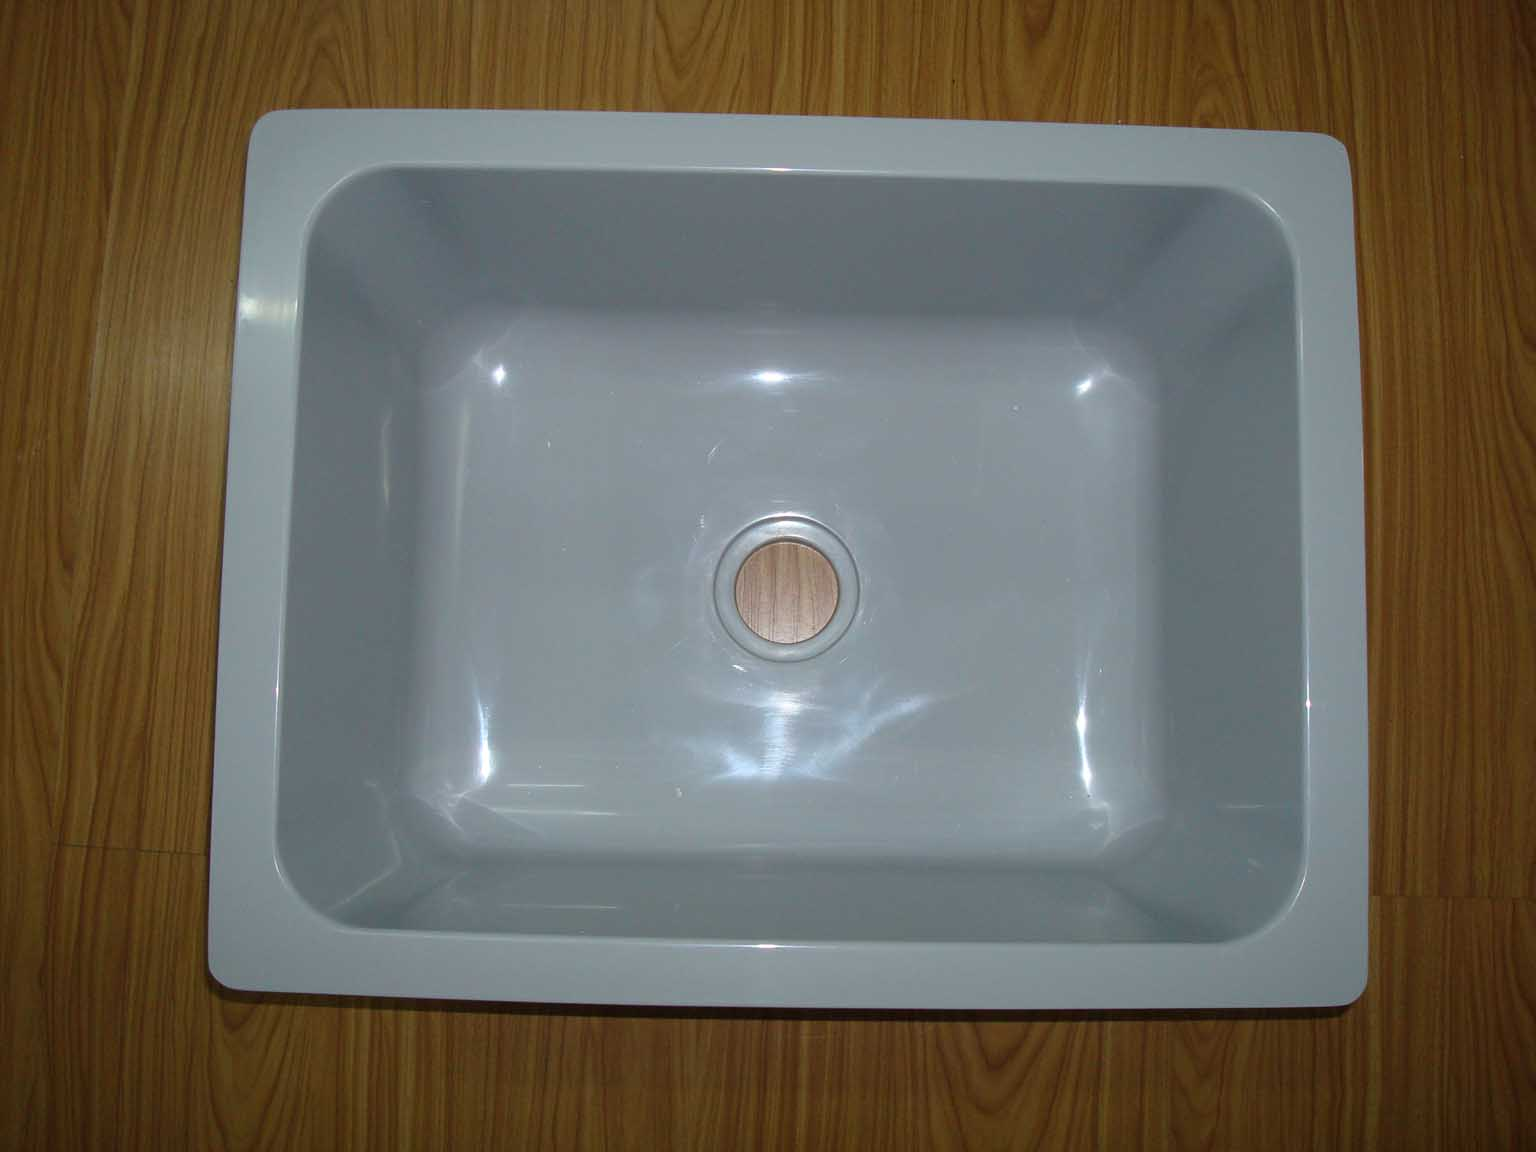 Delicieux Epoxy Resin WorkTop|Sink|Cup